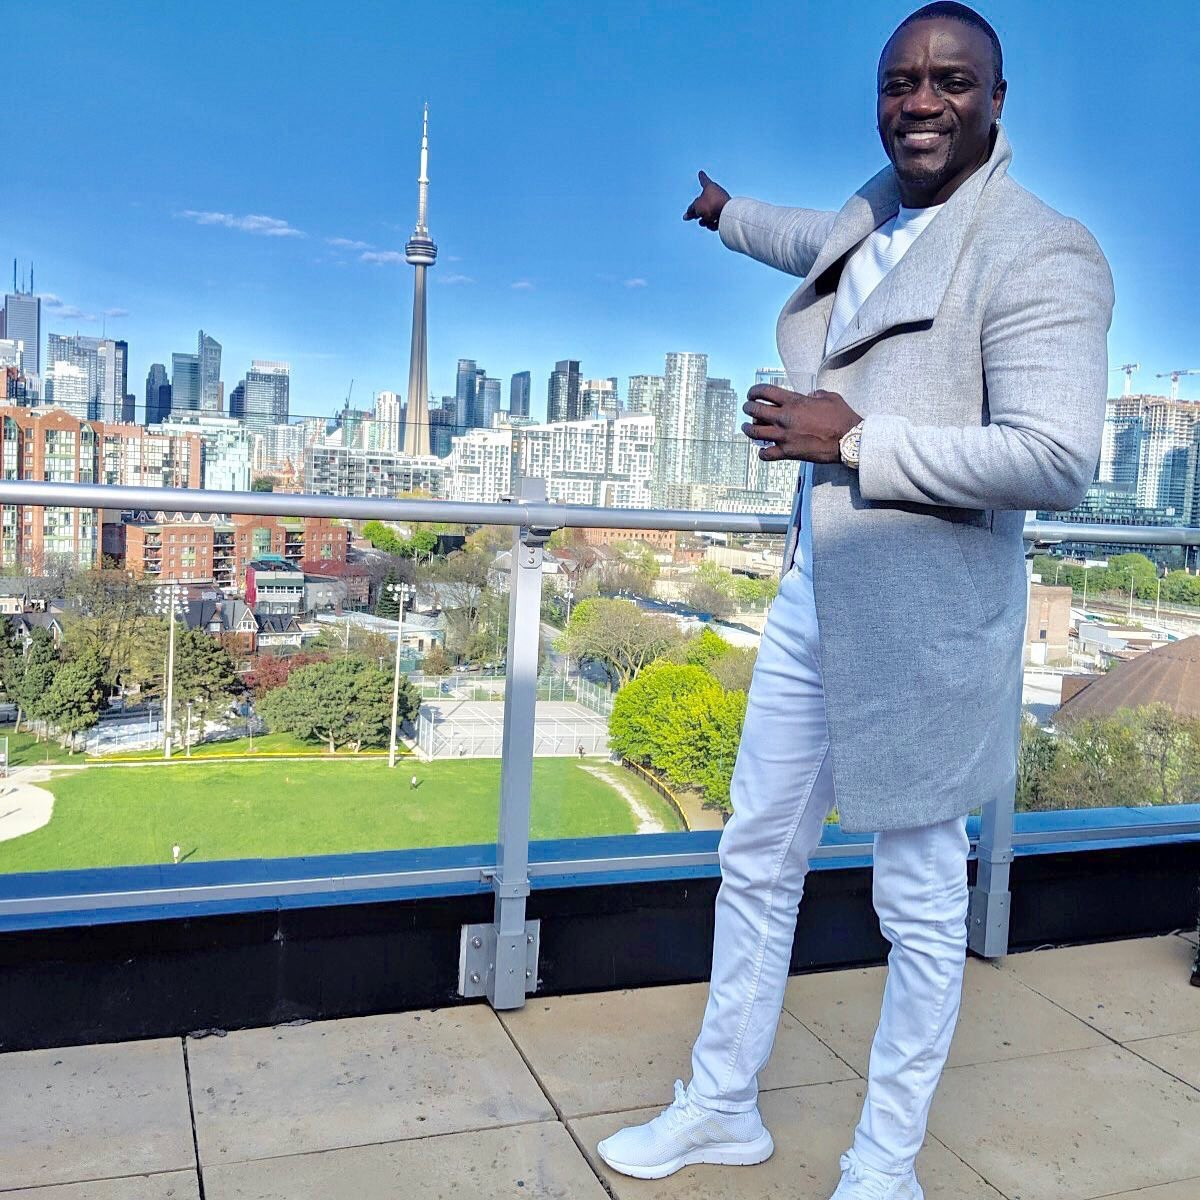 Enjoying Toronto ???????? https://t.co/aBZJ6Vt1Zi